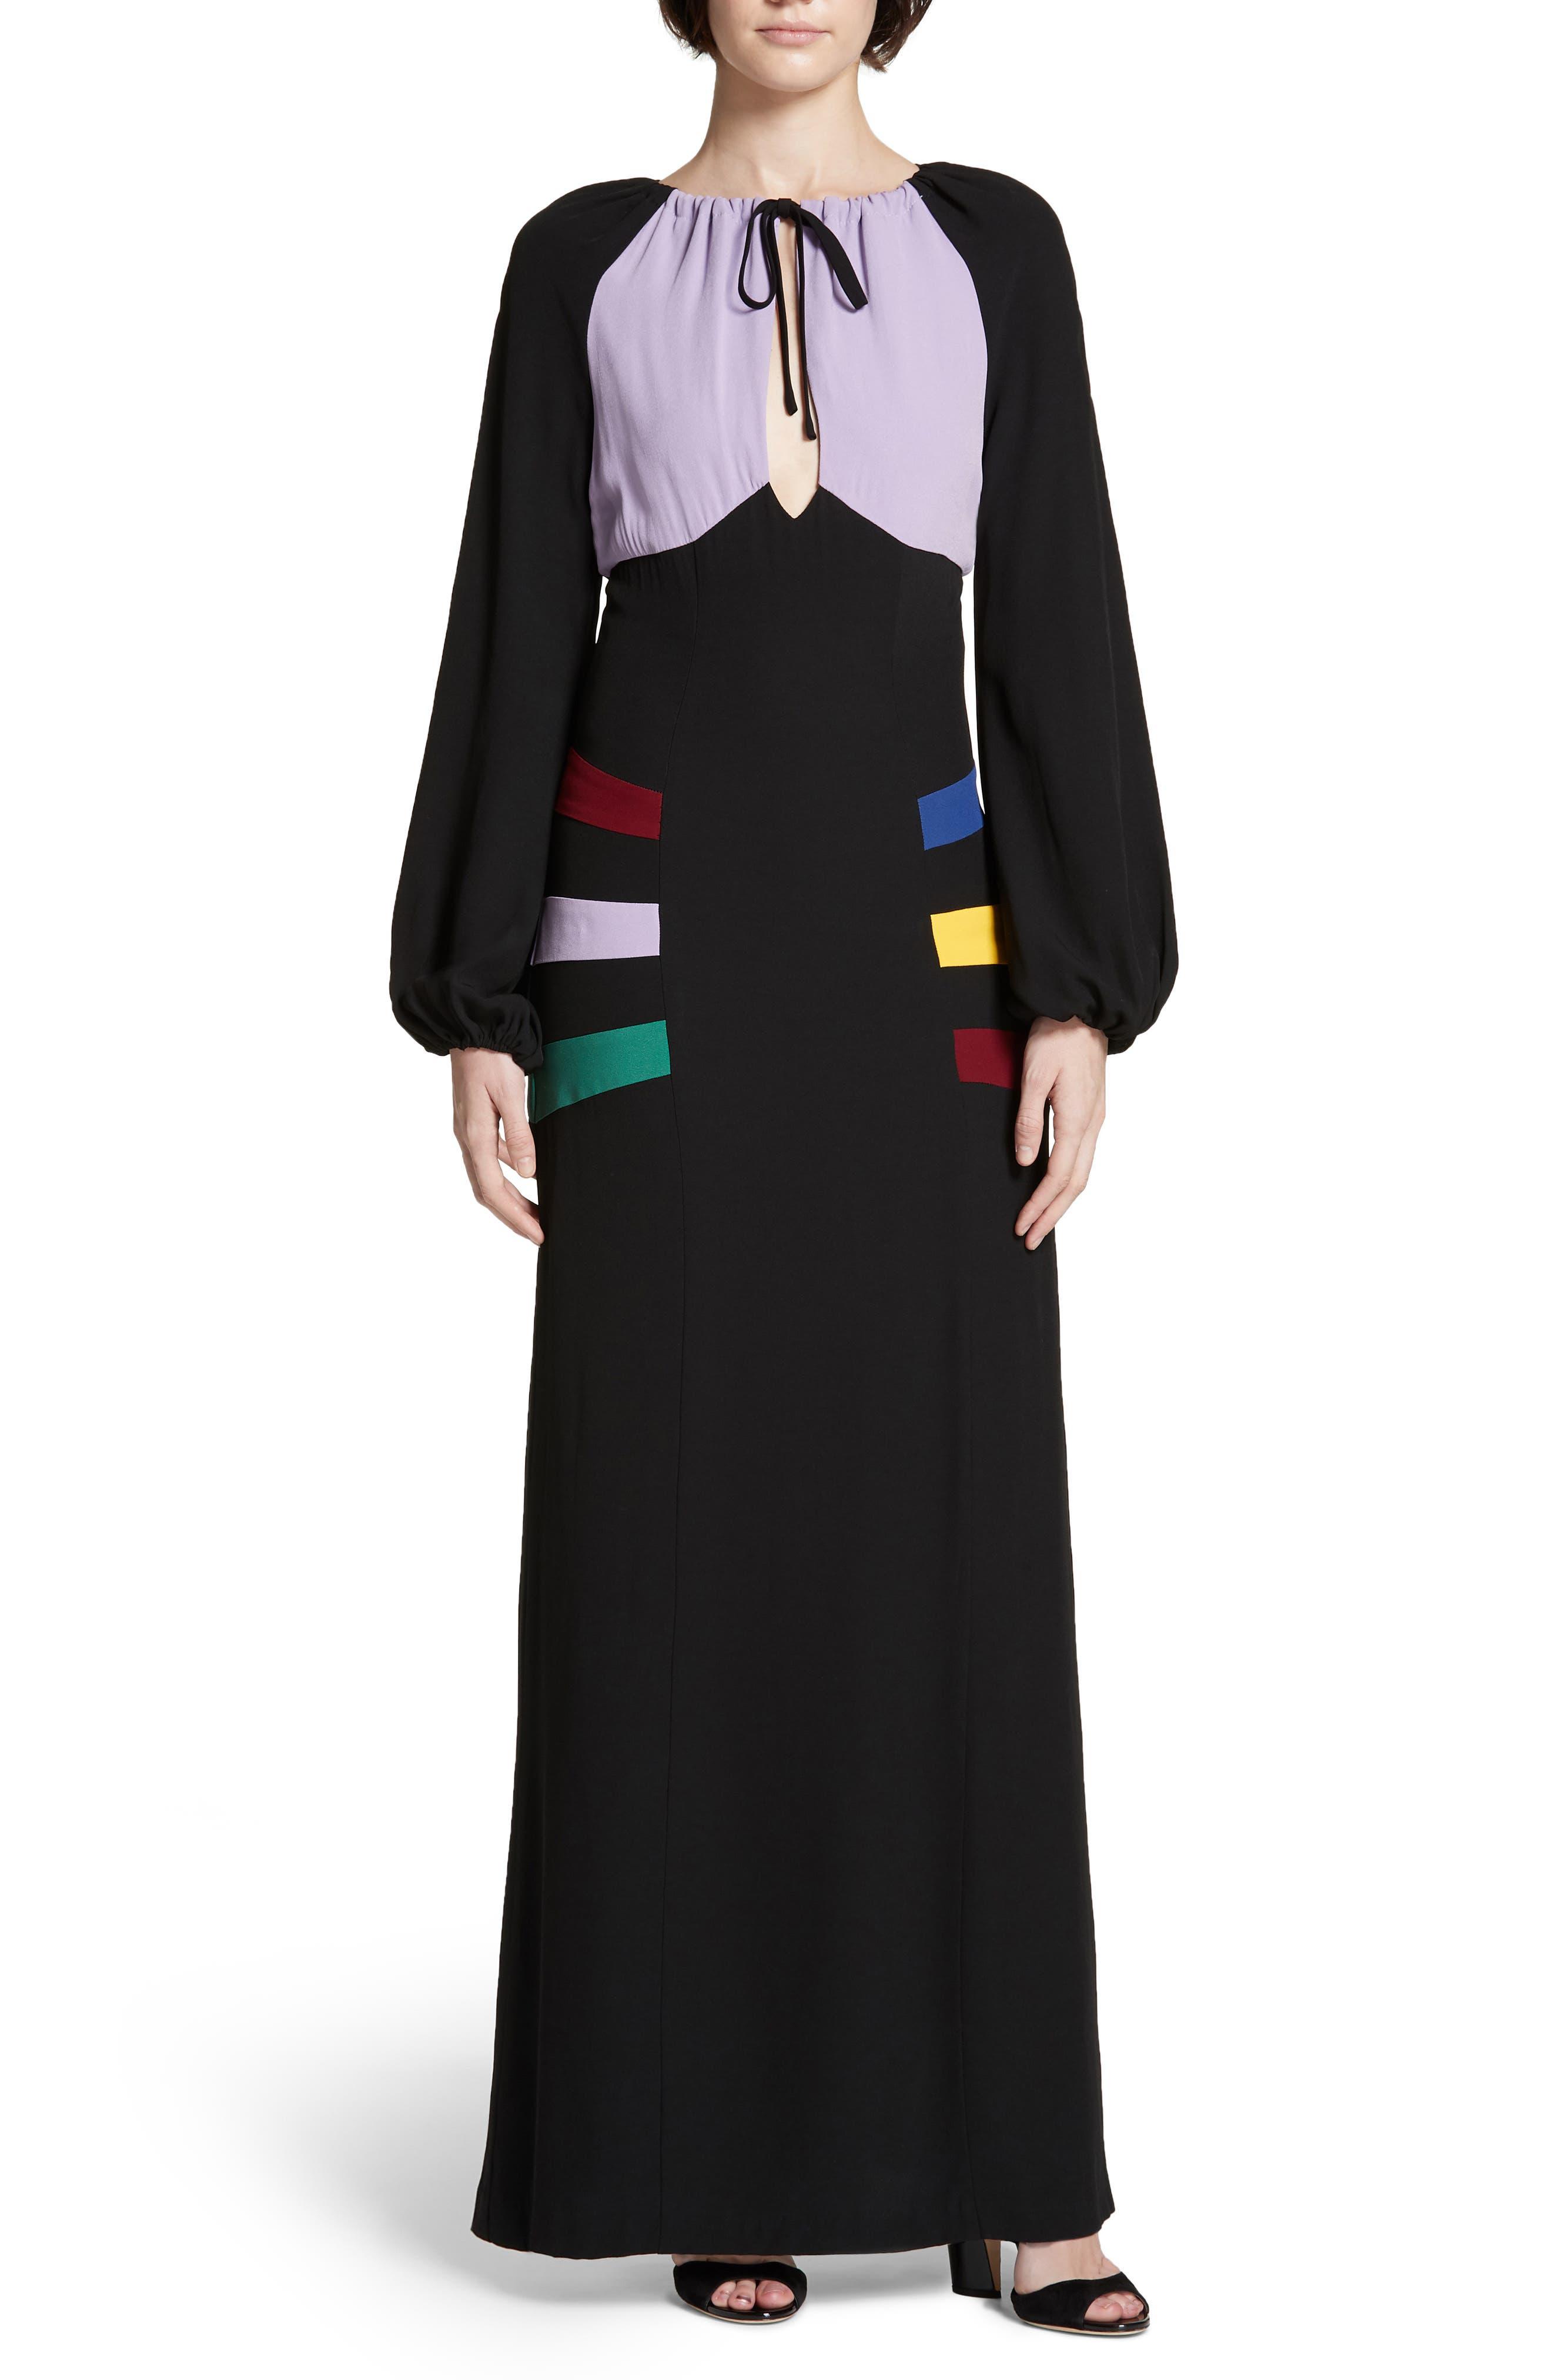 70s Prom, Formal, Evening, Party Dresses Womens Staud Pacha Maxi Dress Size 6 - Black $345.00 AT vintagedancer.com